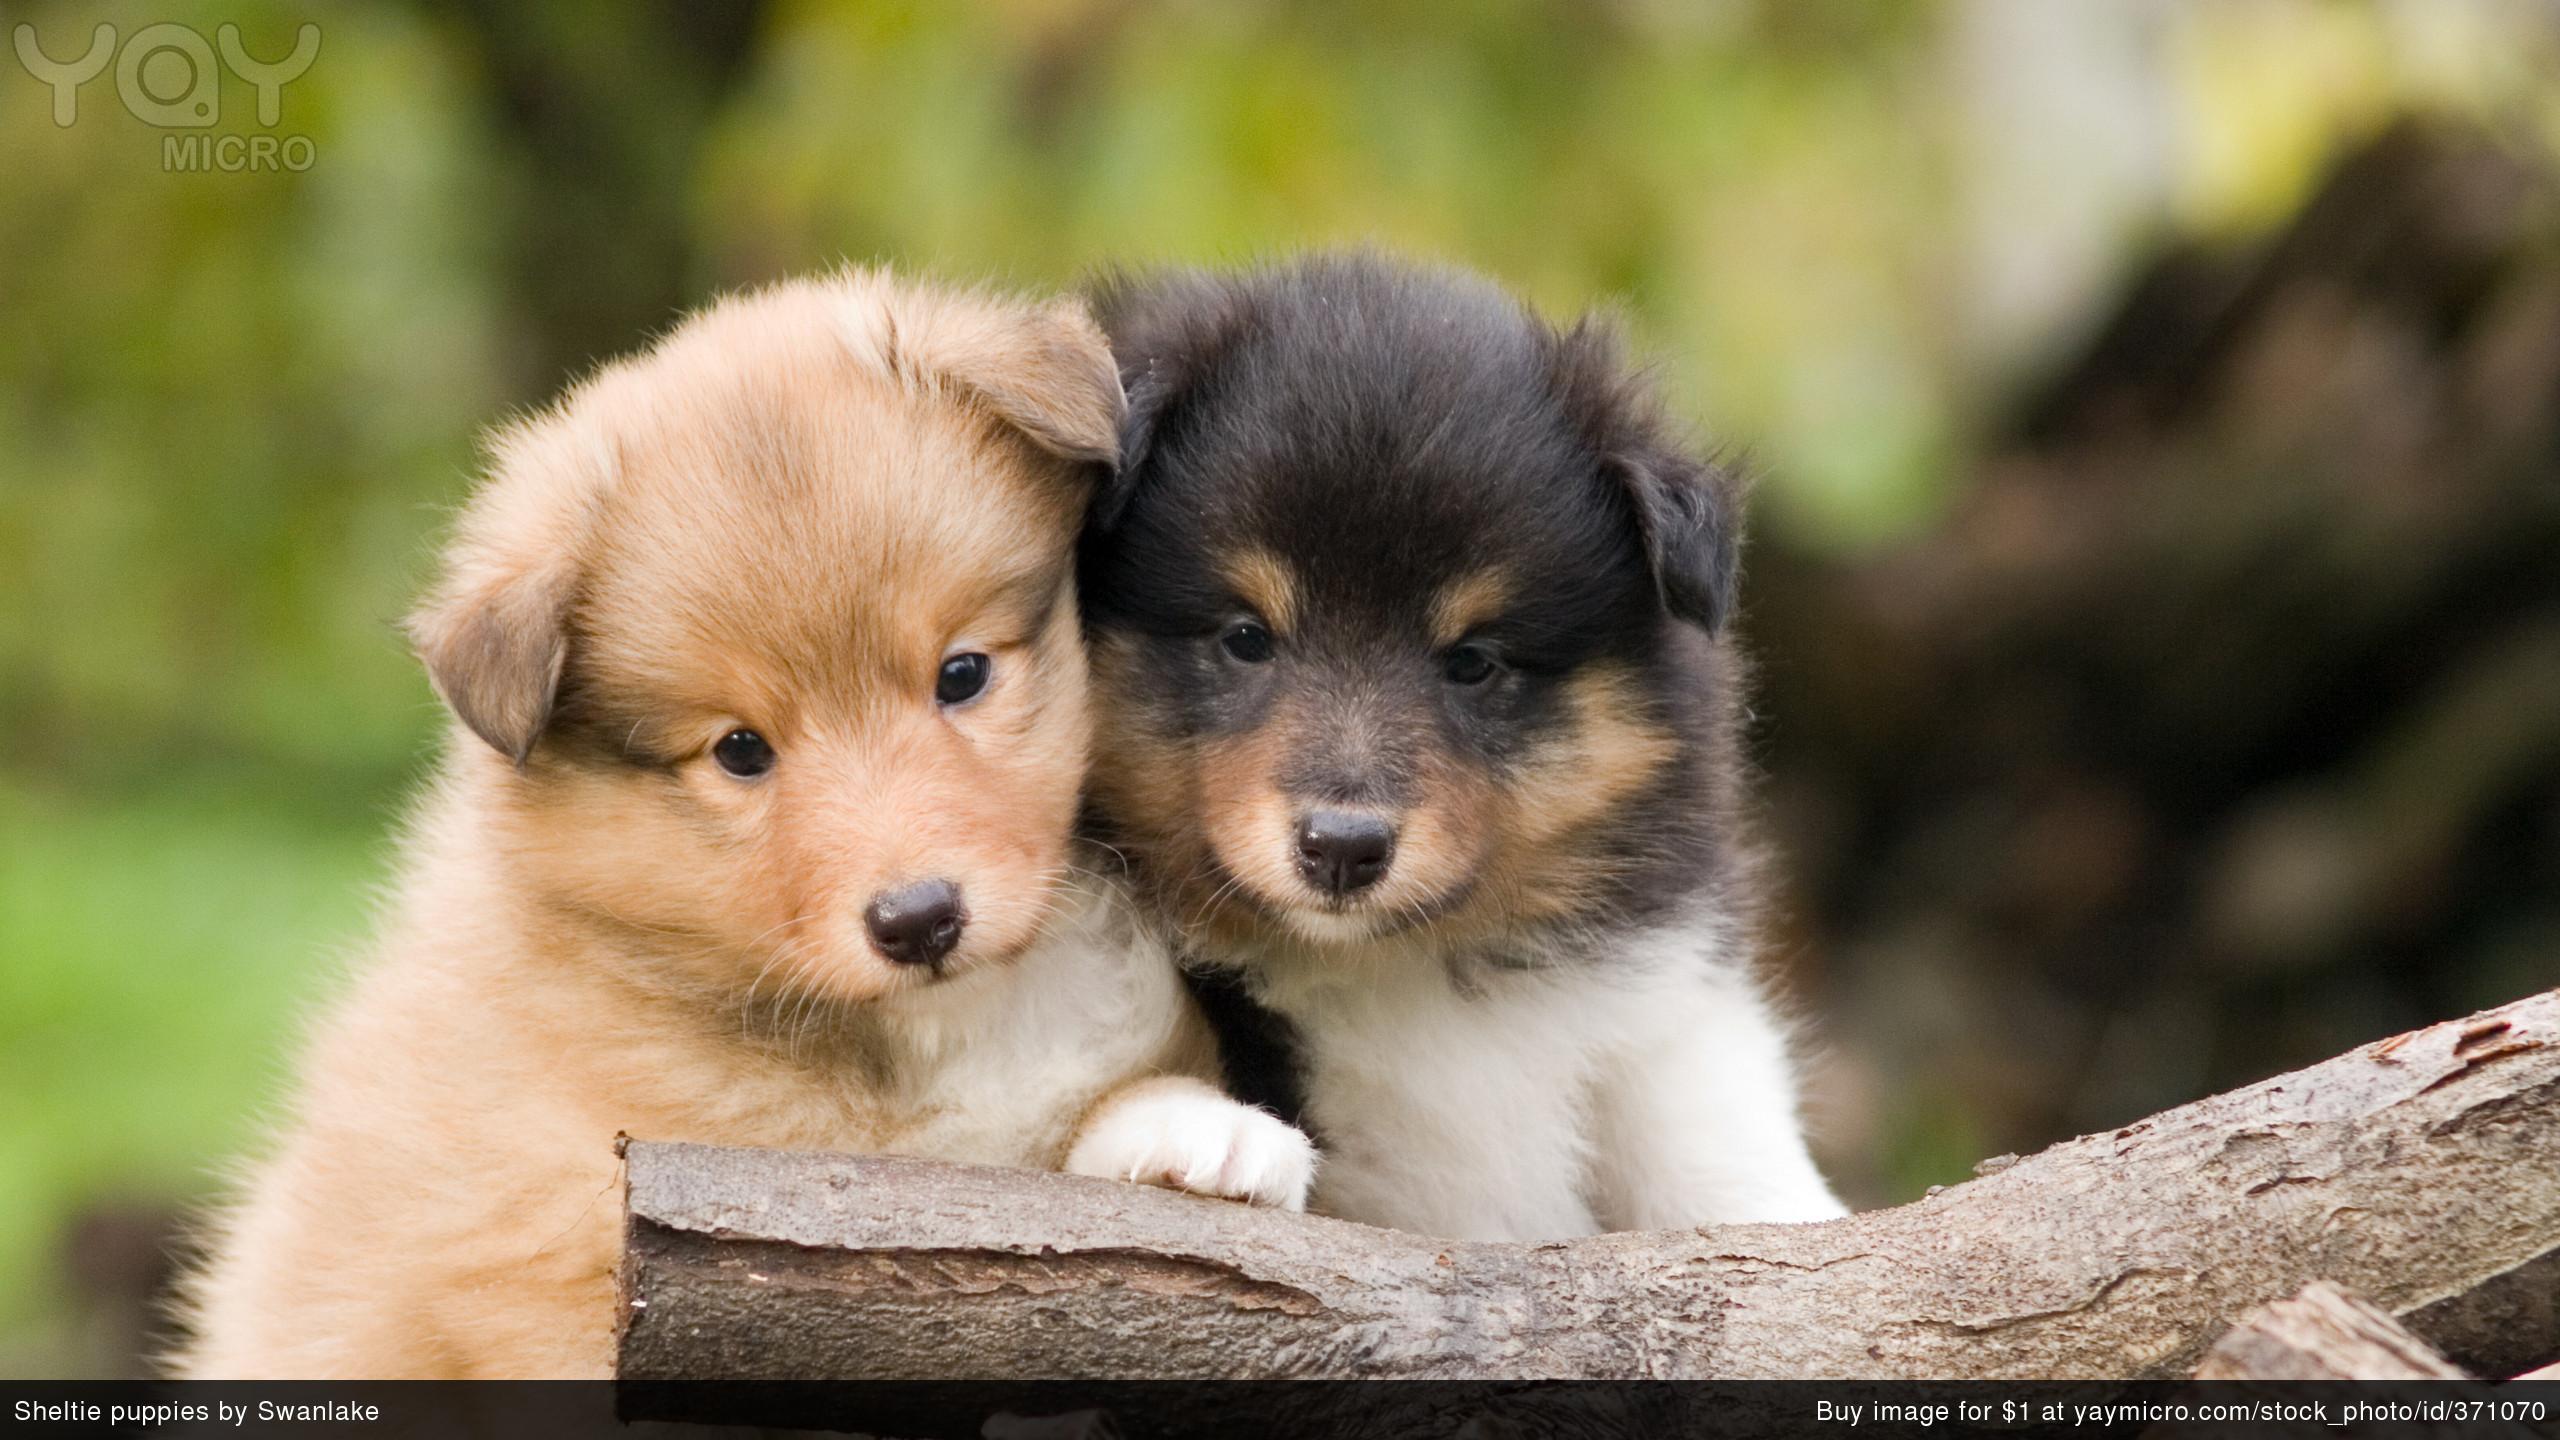 Sheltie Puppies in 2560 x 1440